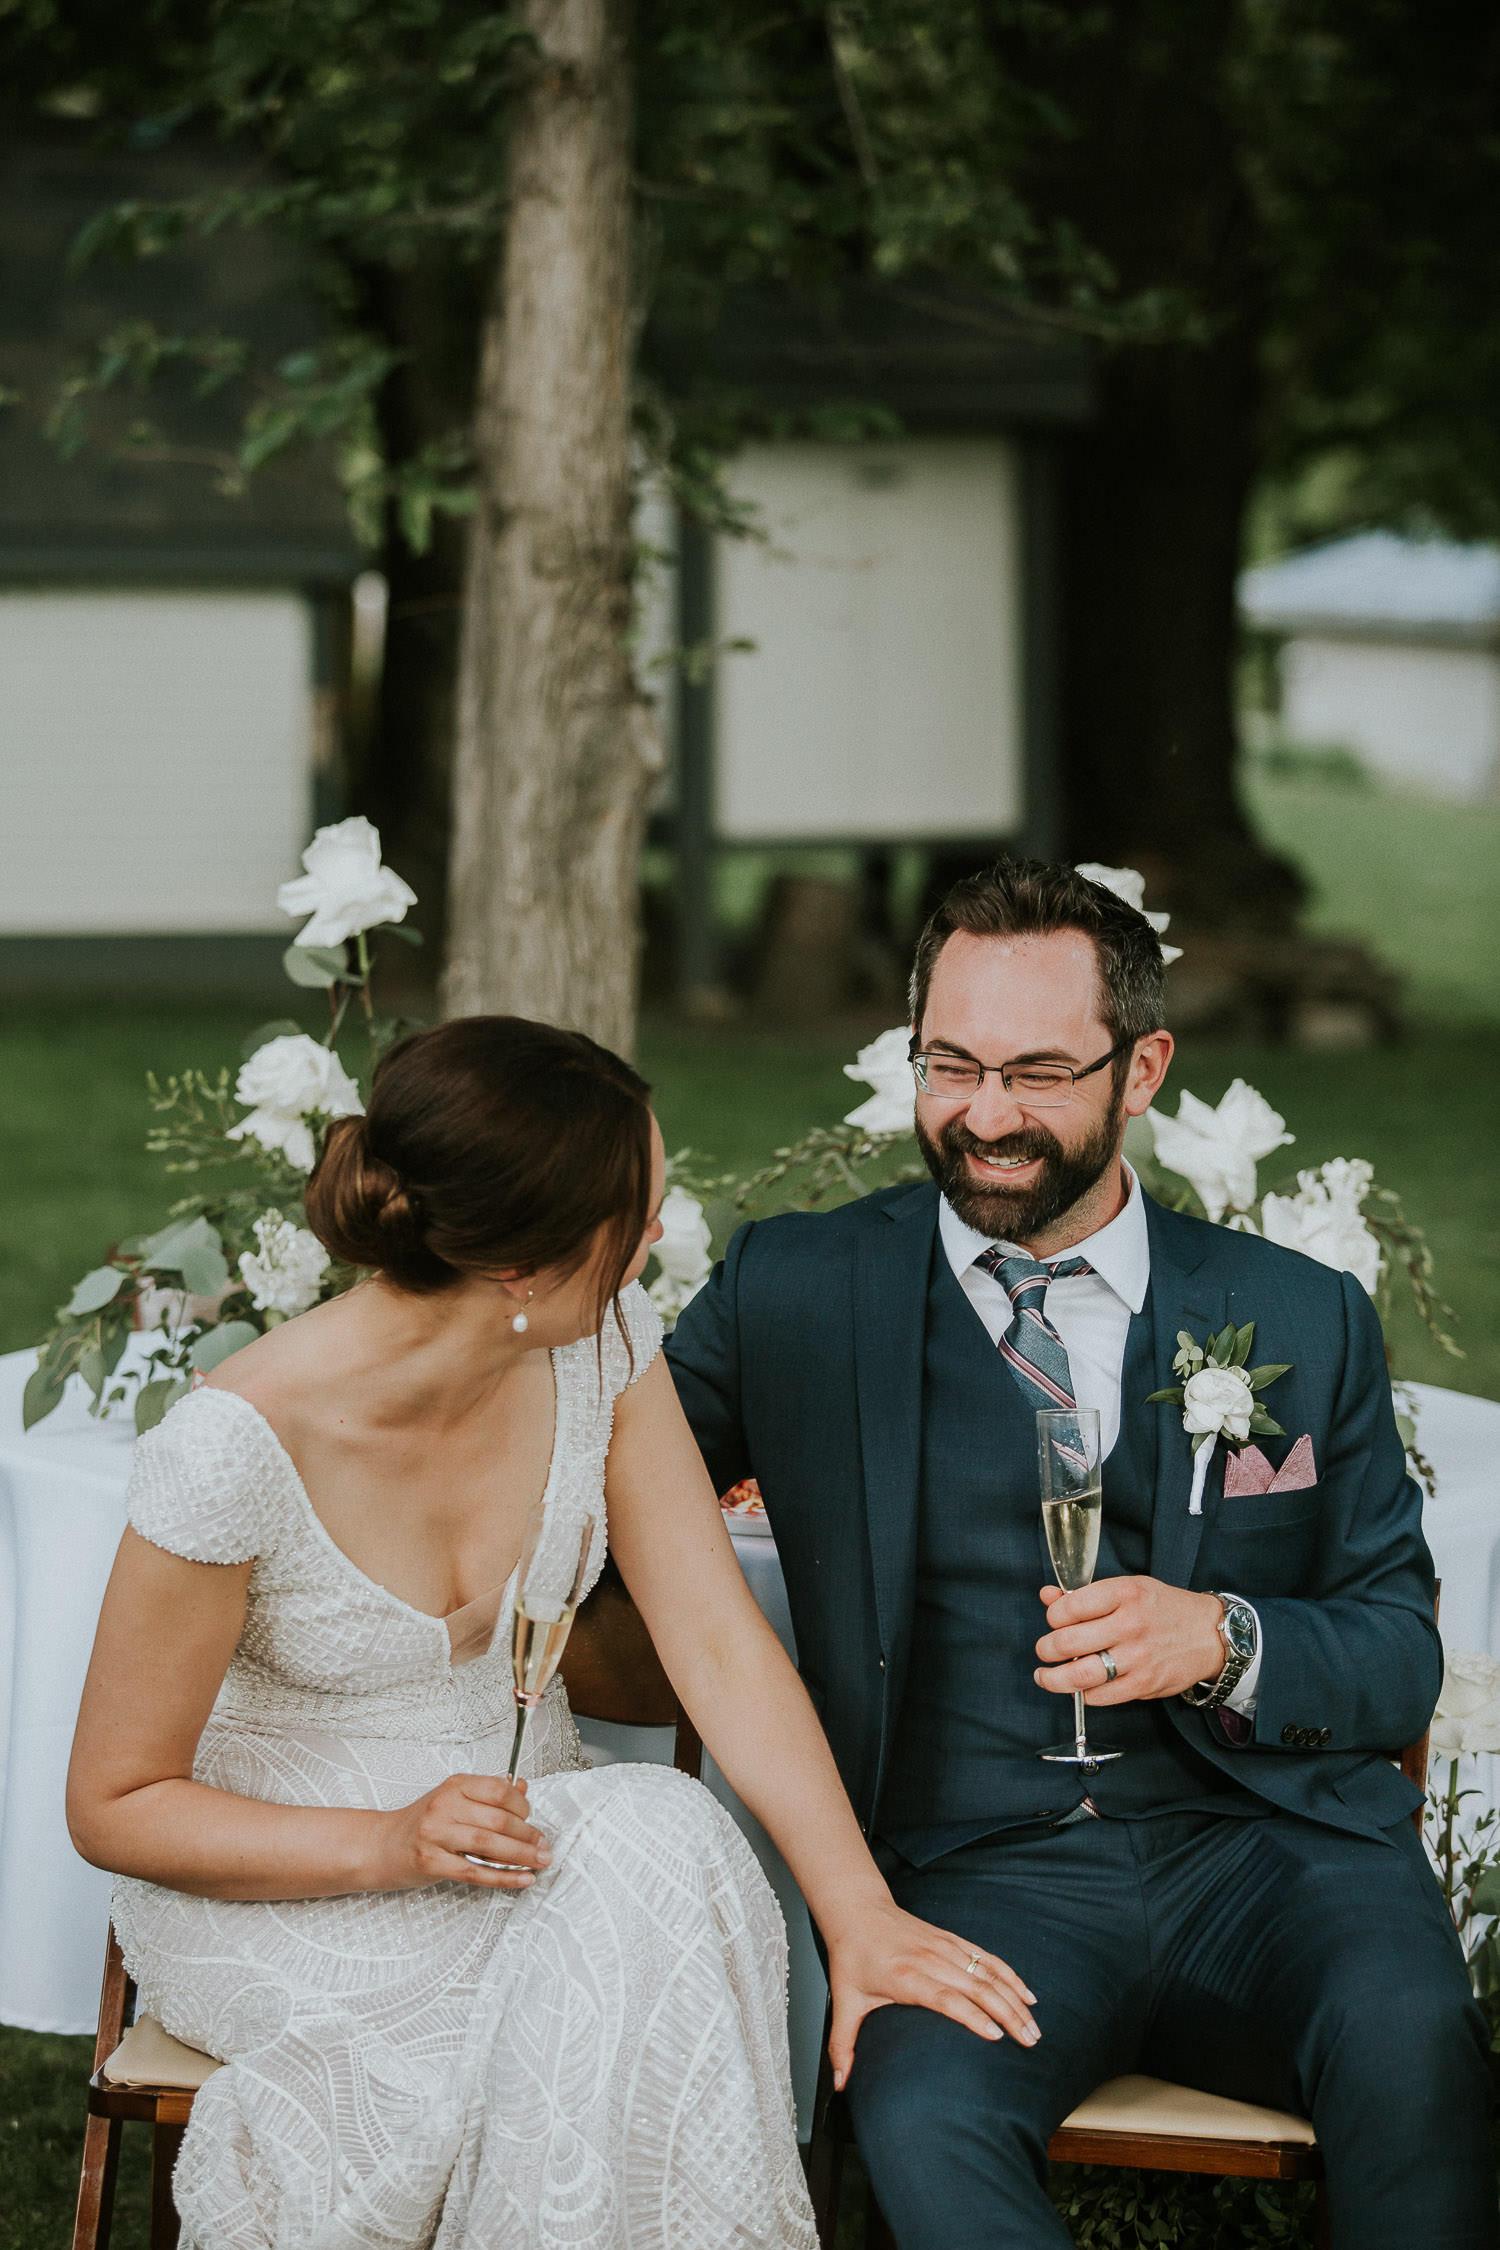 summer-backyard-wedding-in-alberta-sarah-pukin-0162